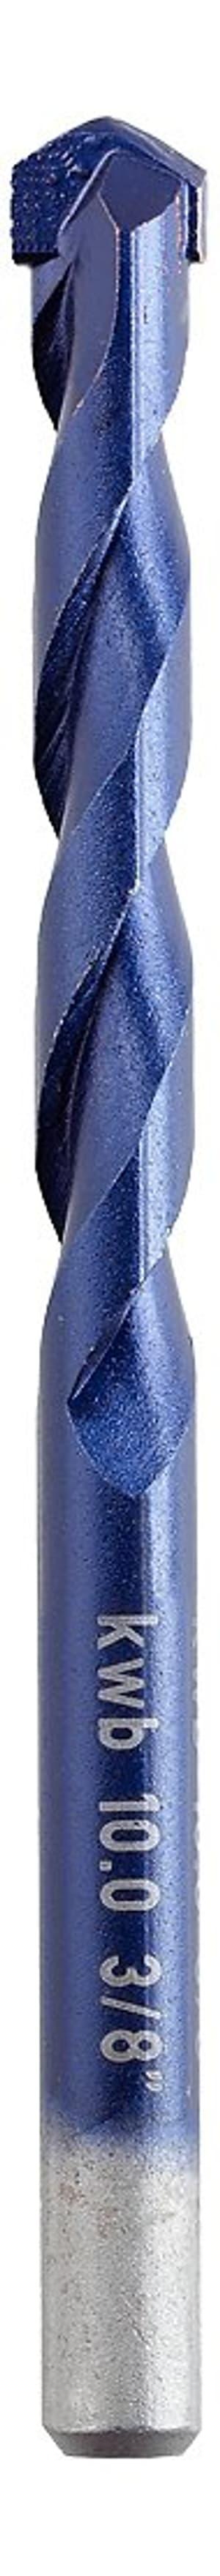 Feinsteinzeugbohrer, ø 5,0 mm